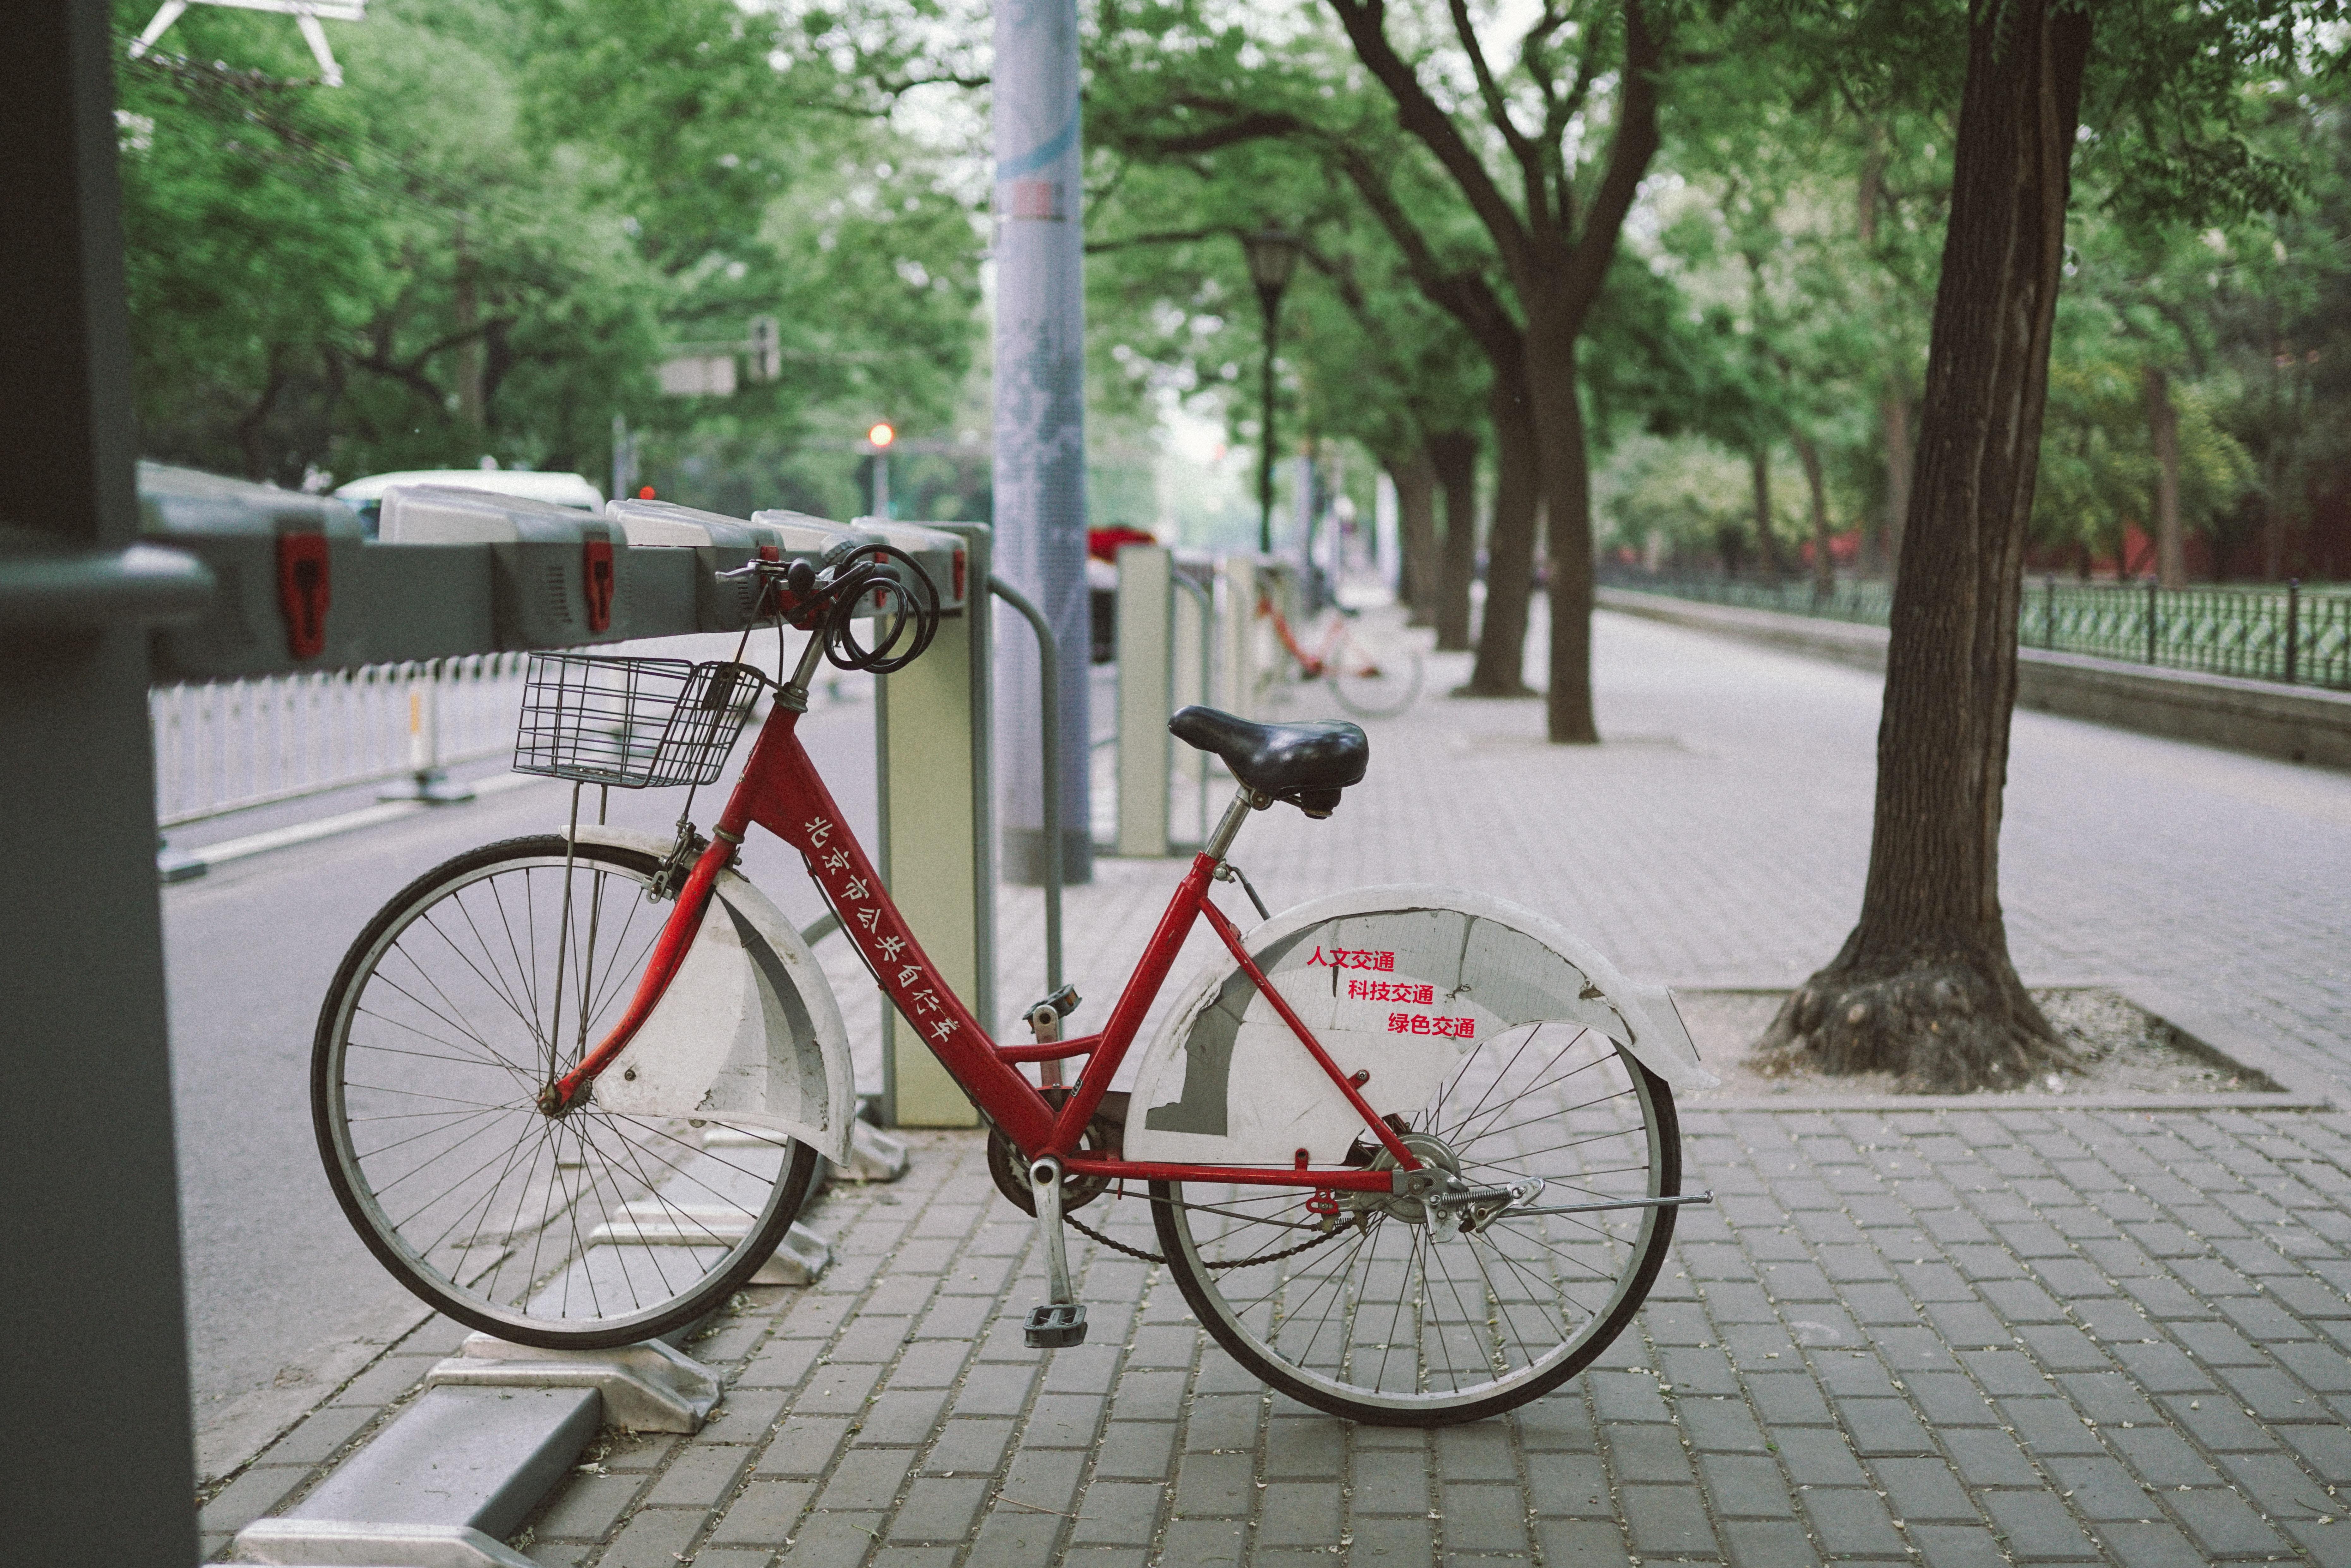 yuanbin-du-88234-unsplash